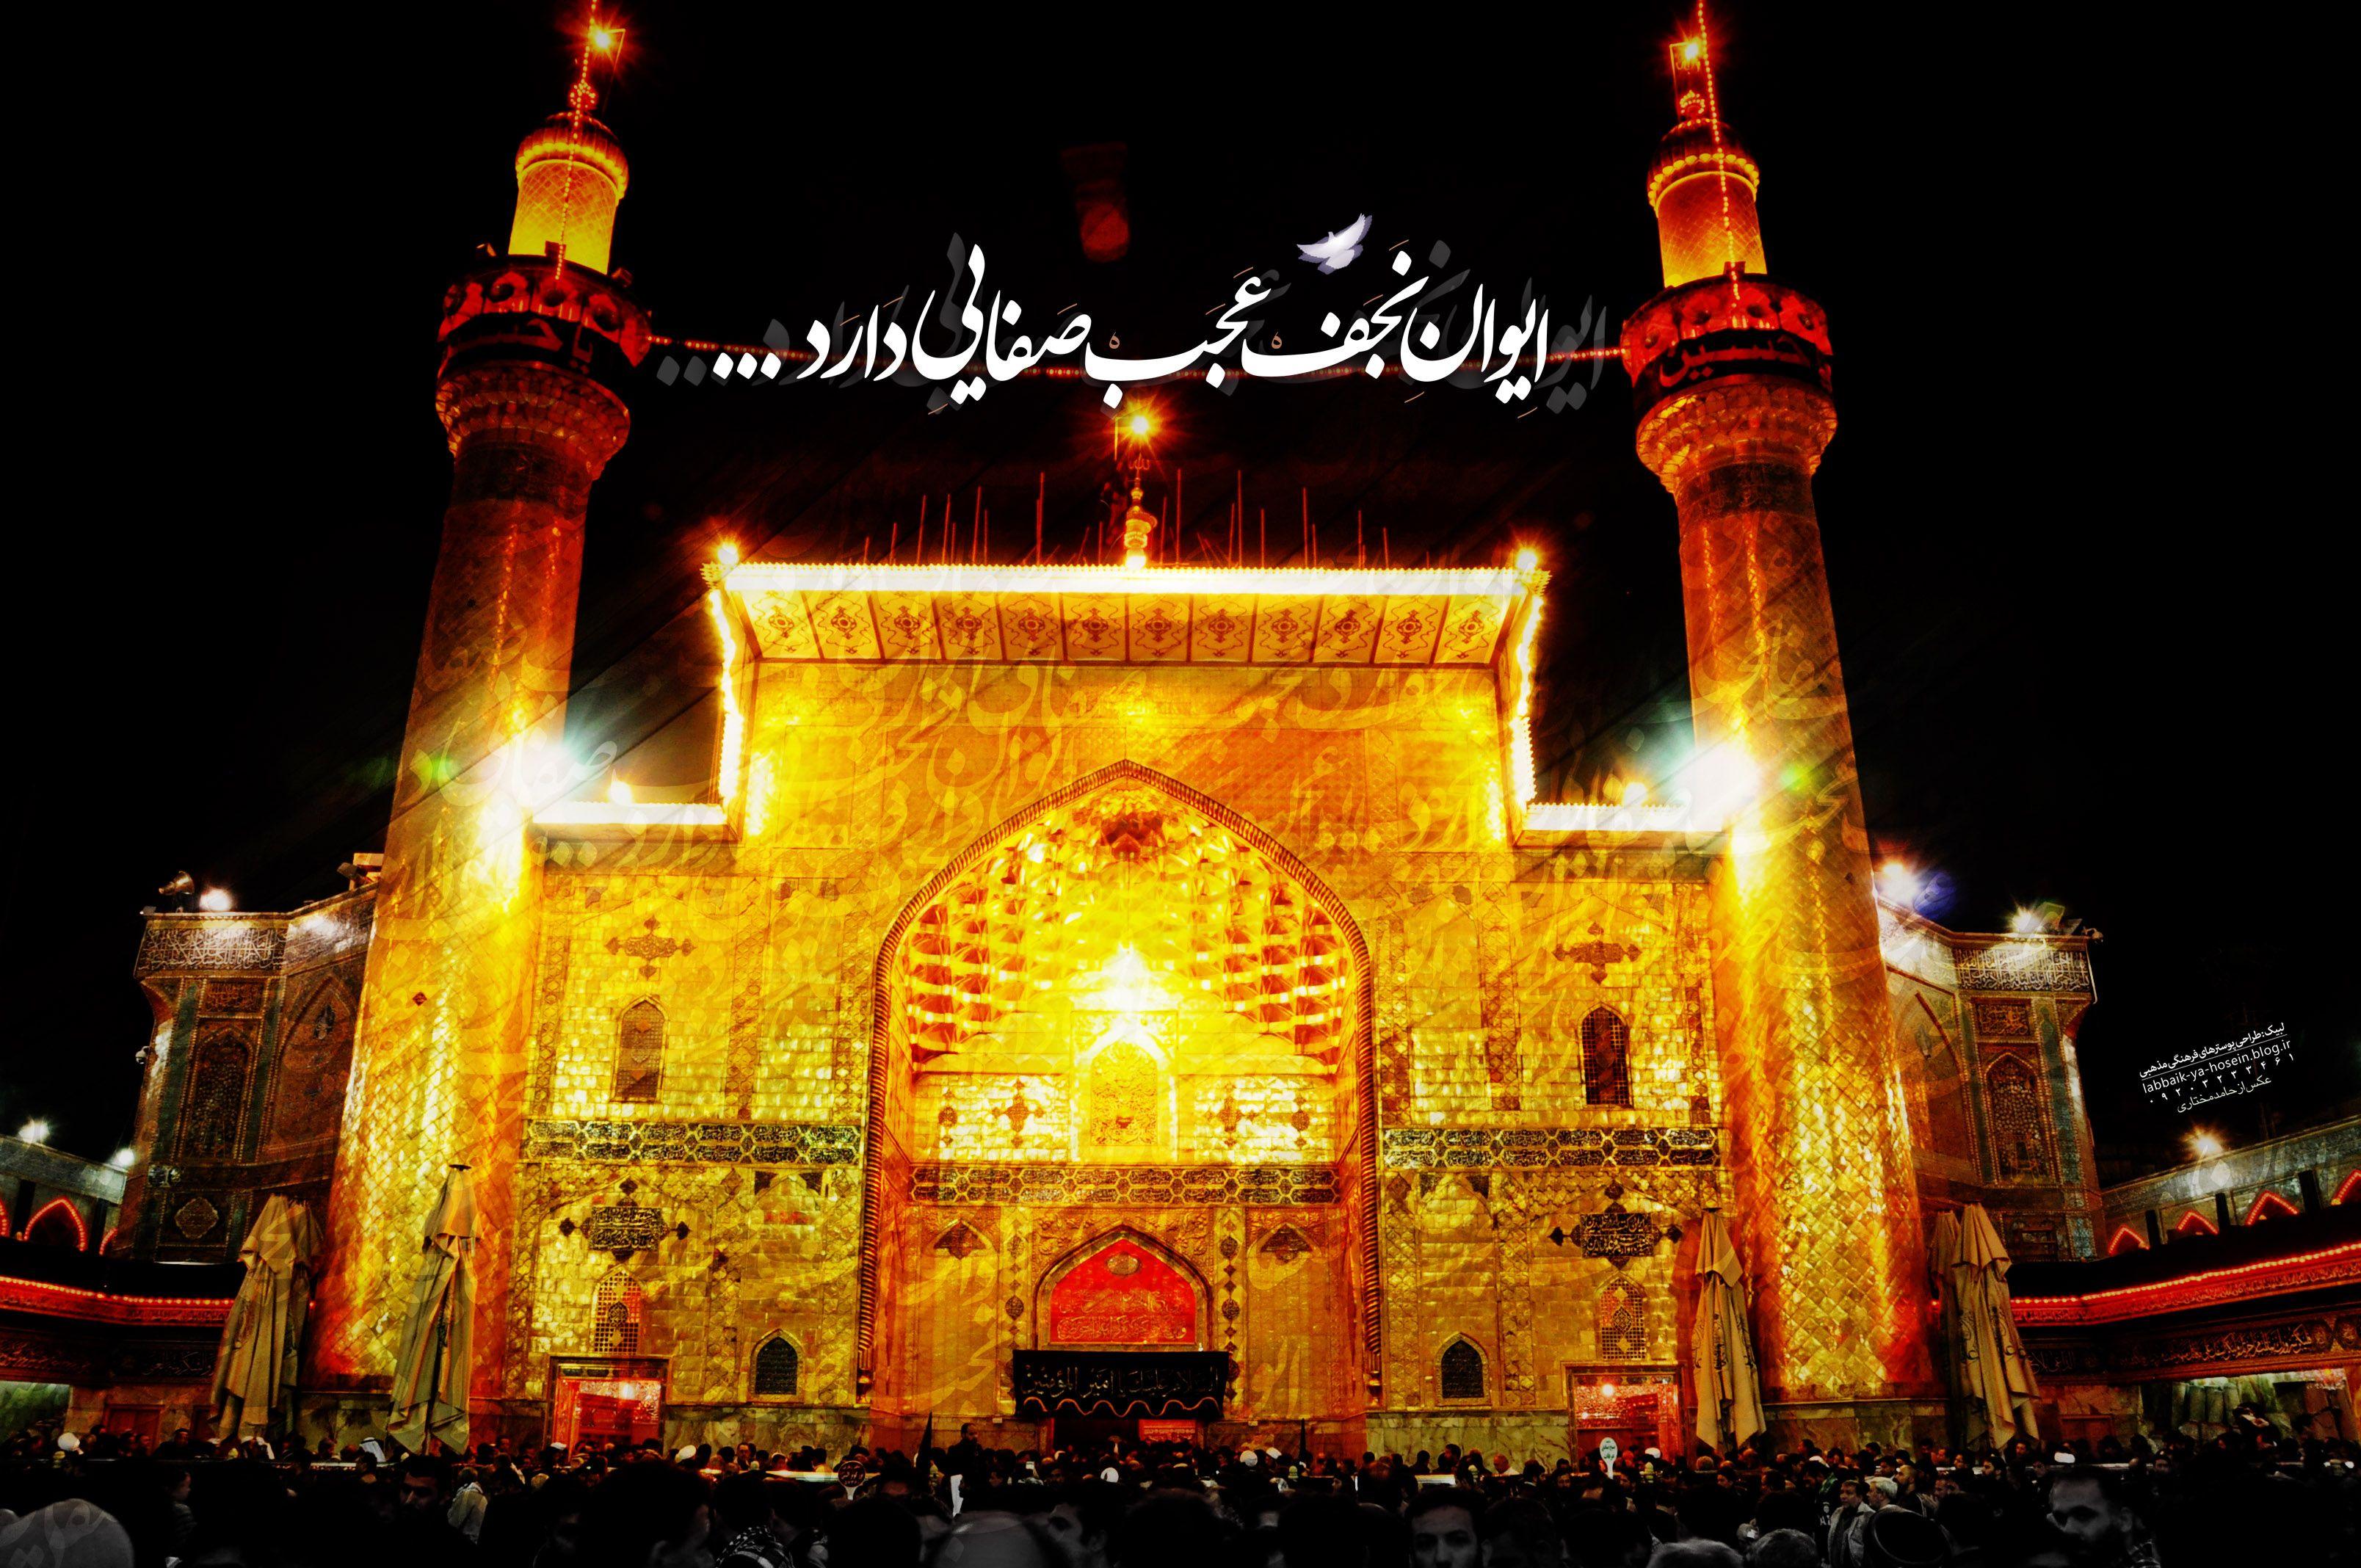 Image Result For ایوان نجف با کیفیت بسیار بالا Imam Ali Barcelona Cathedral Taj Mahal